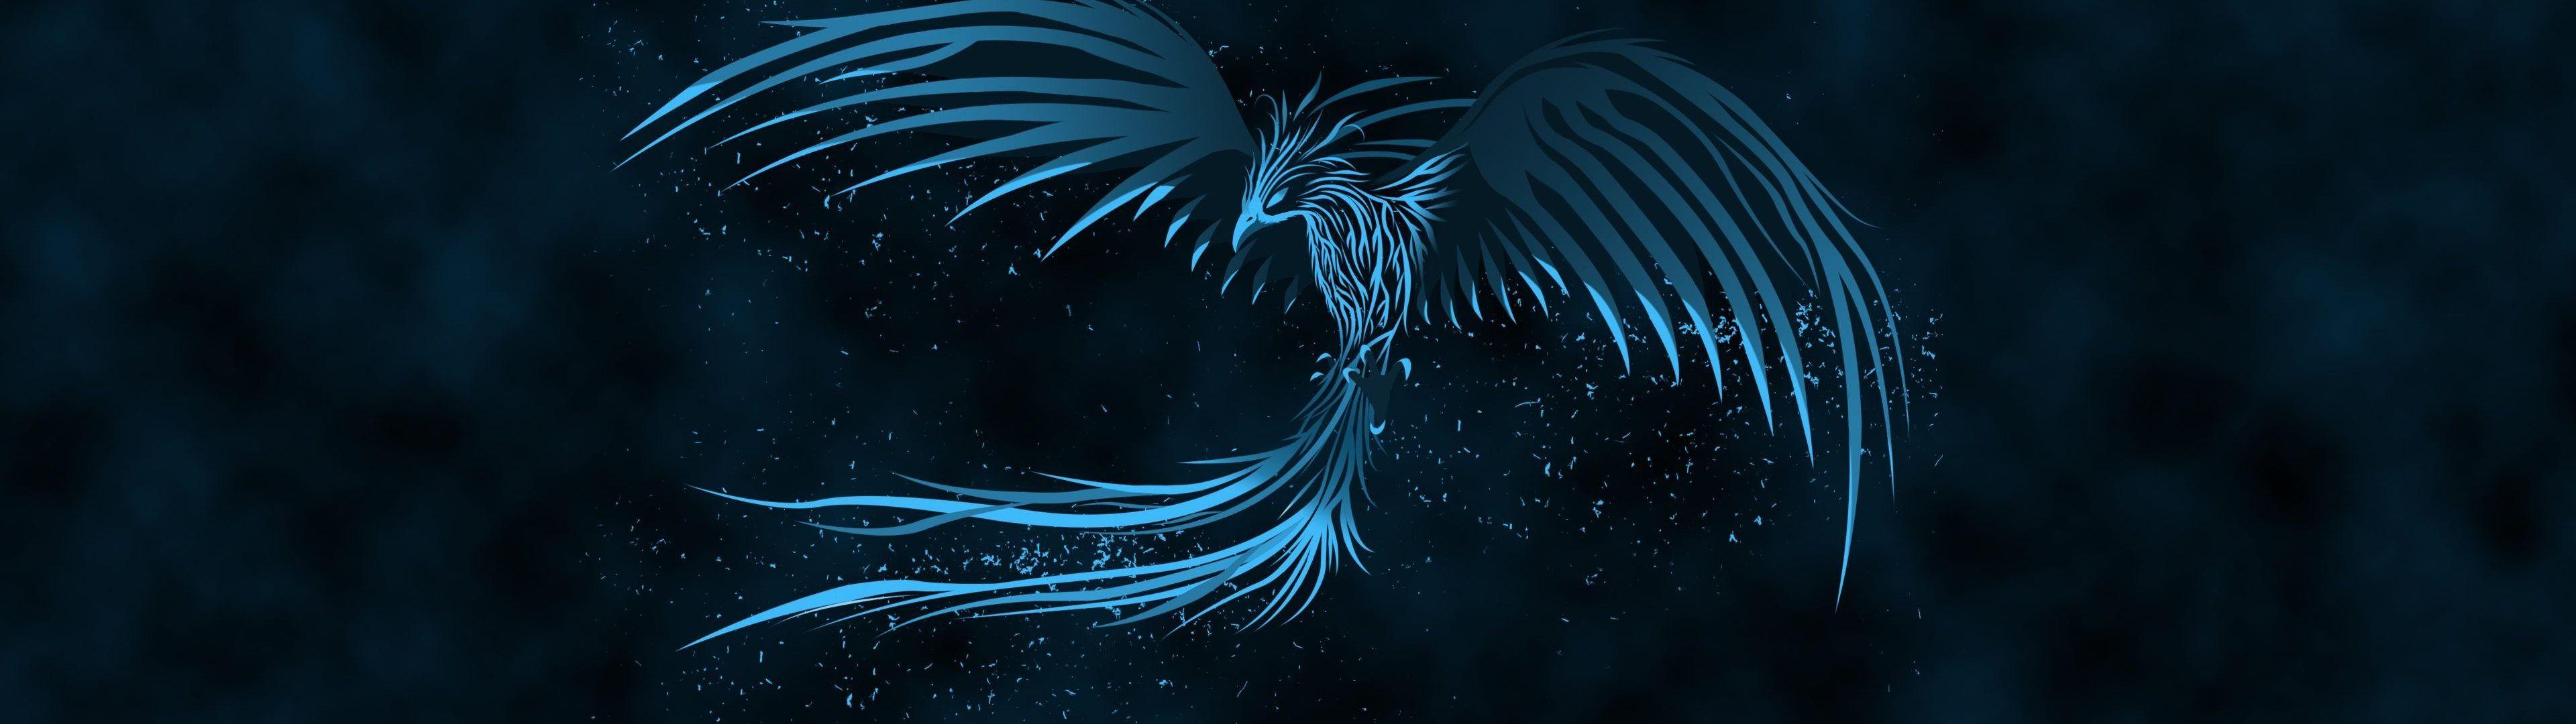 Blue Phoenix Dual Monitor Wallpaper 3840x1080 | Dual ...